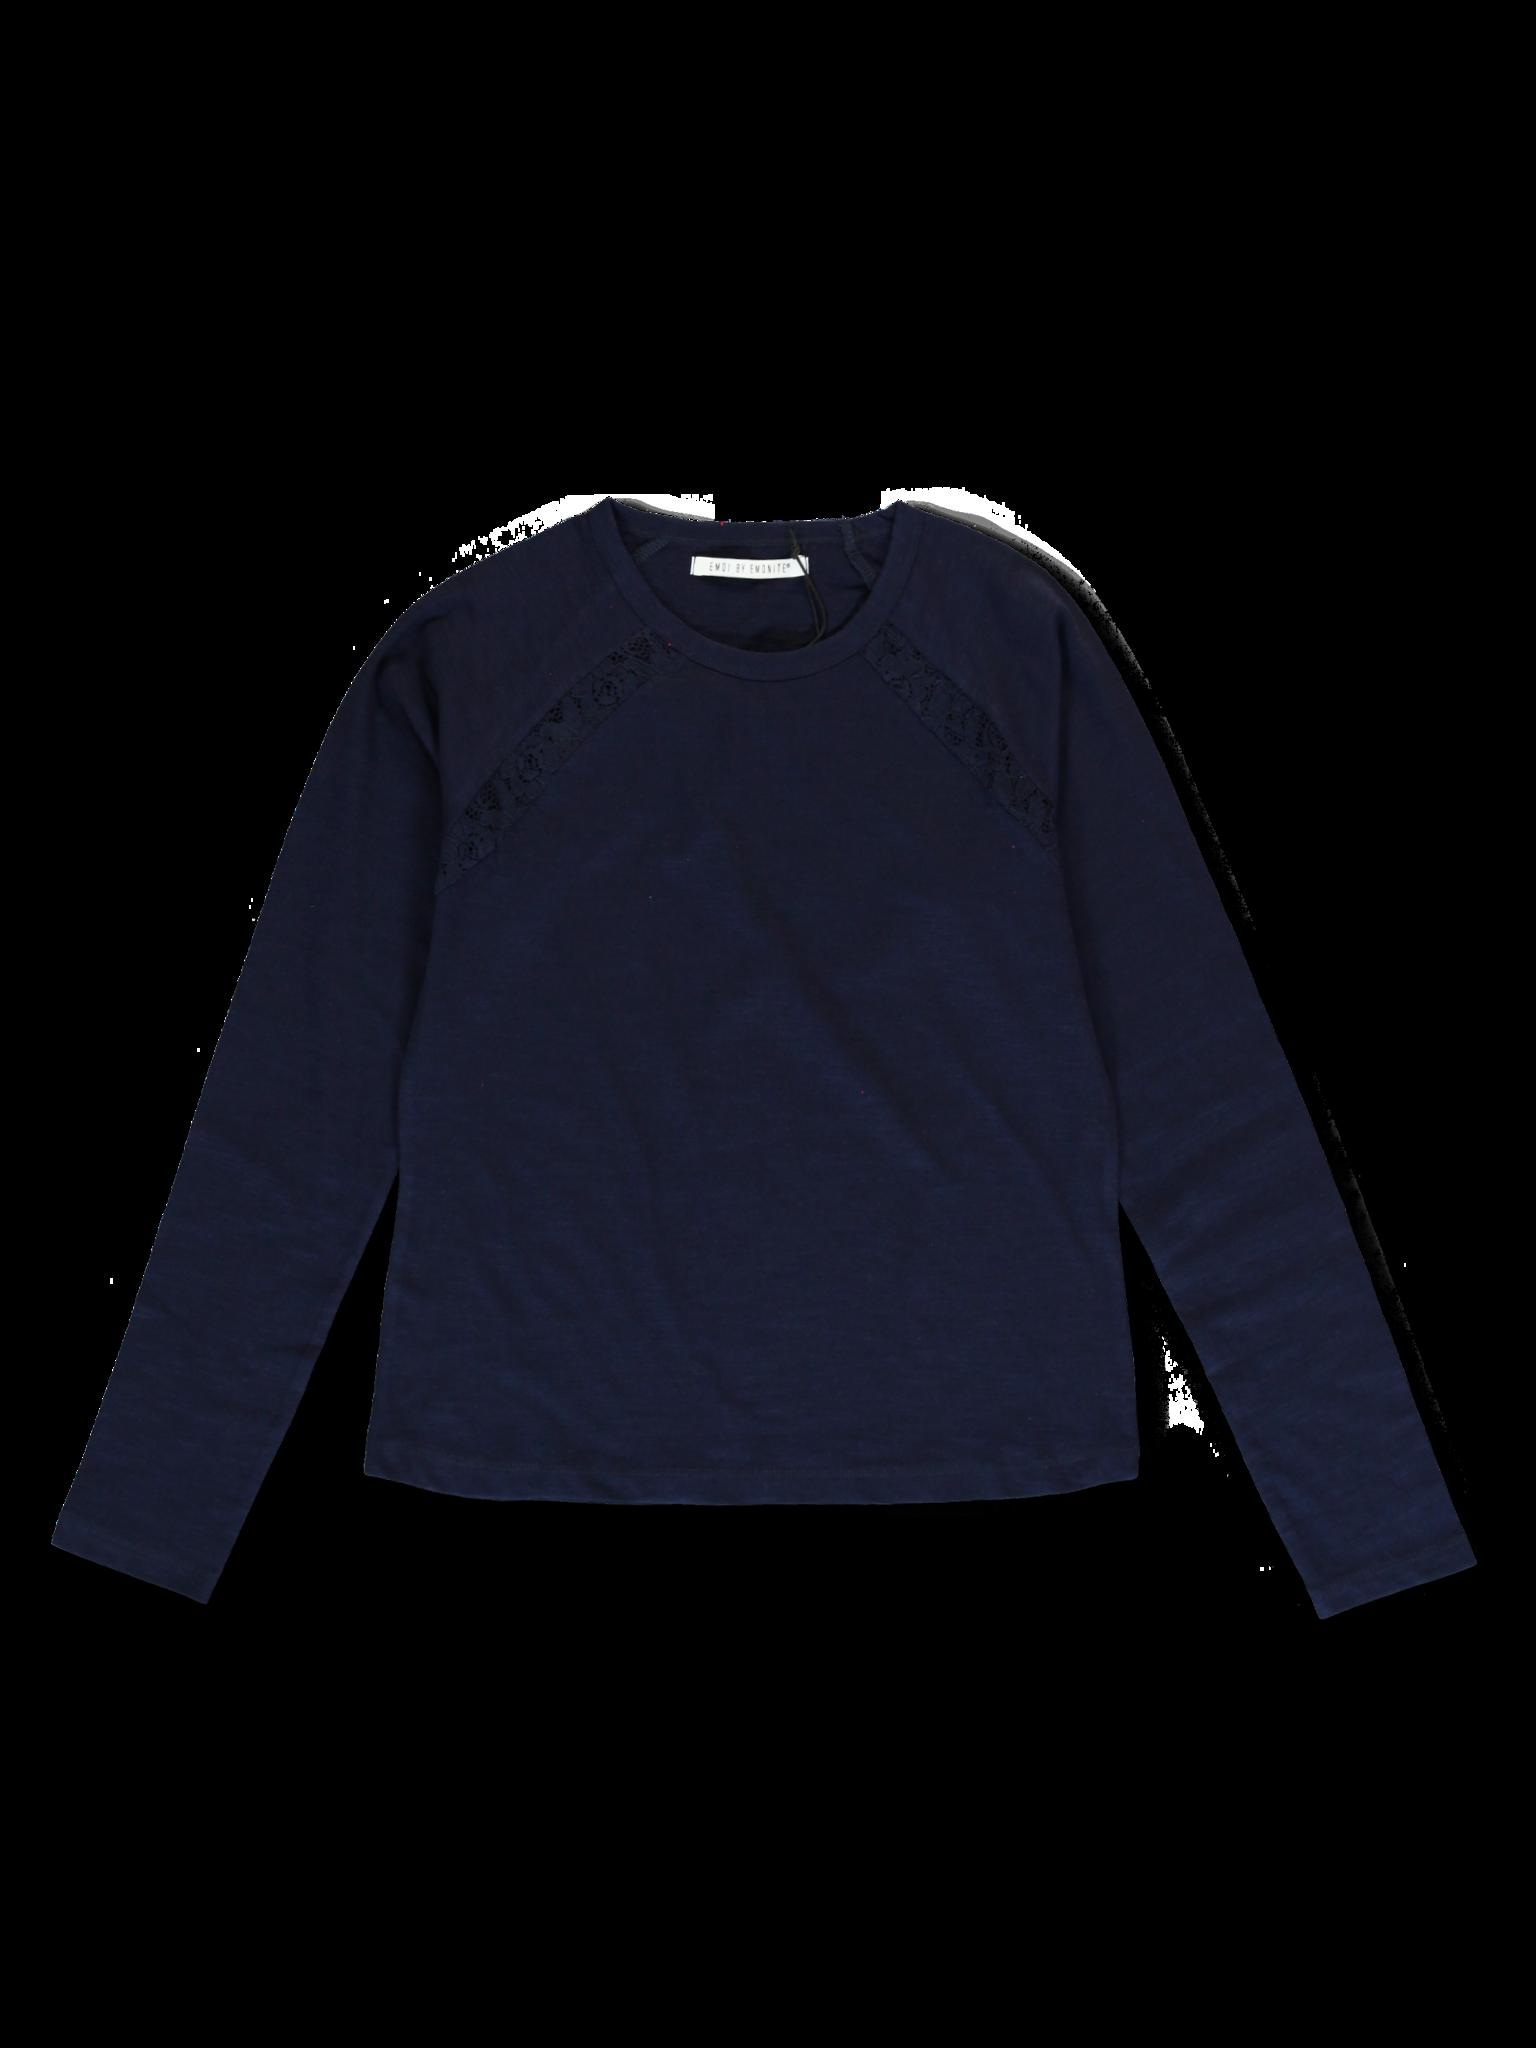 All Brands | Winterproducts Ladies | T-shirt | 24 pcs/box